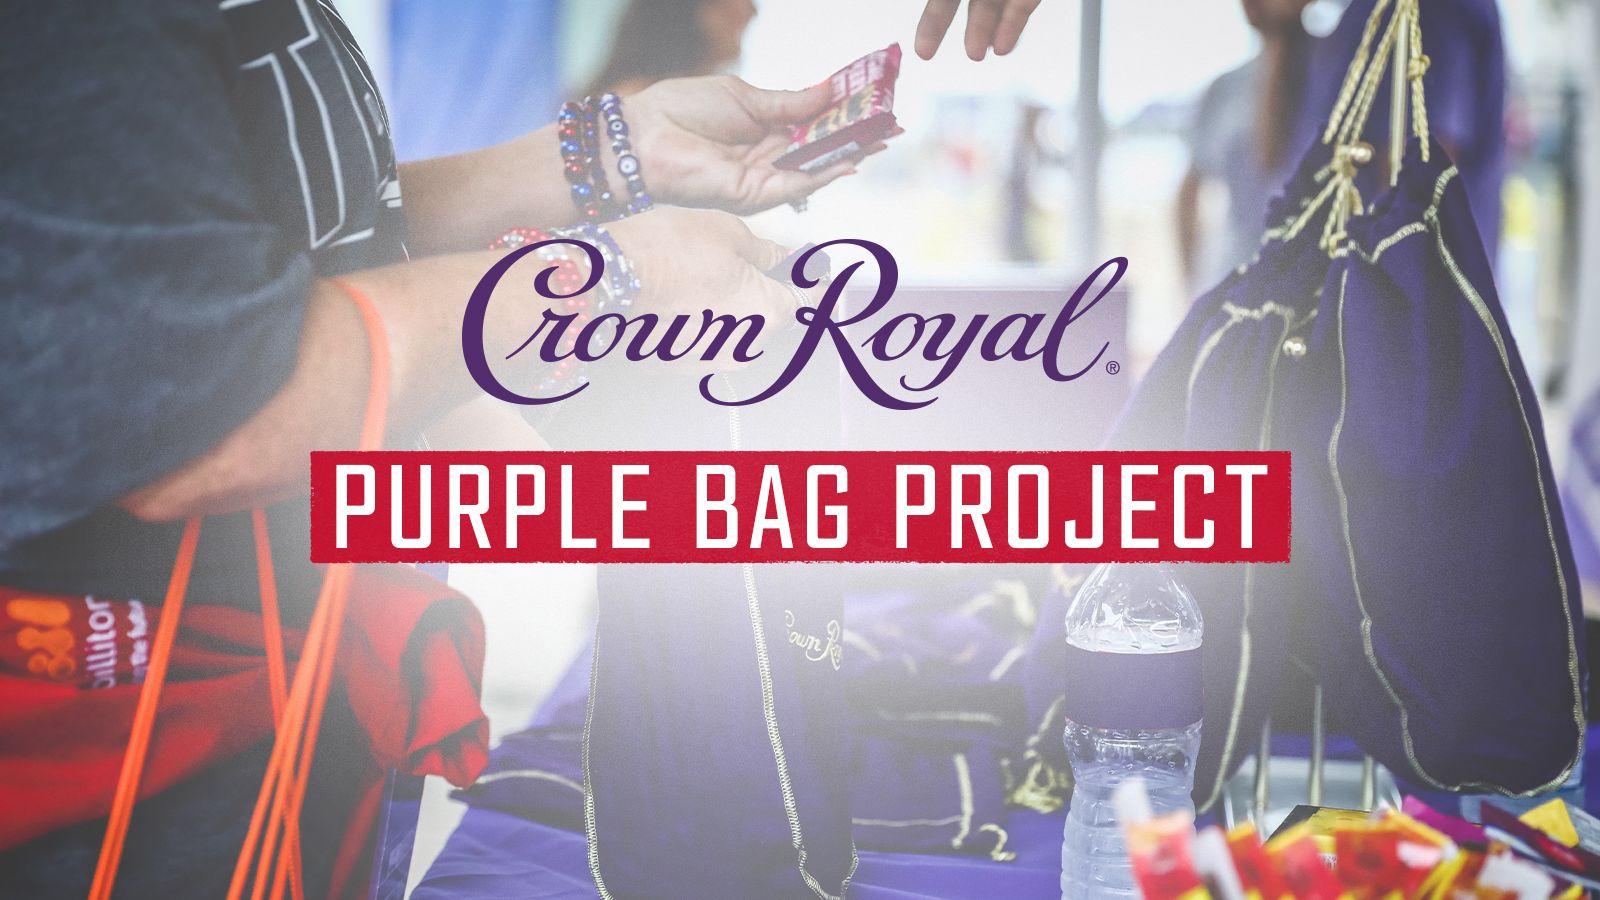 Crown Royal Purple Bag Project